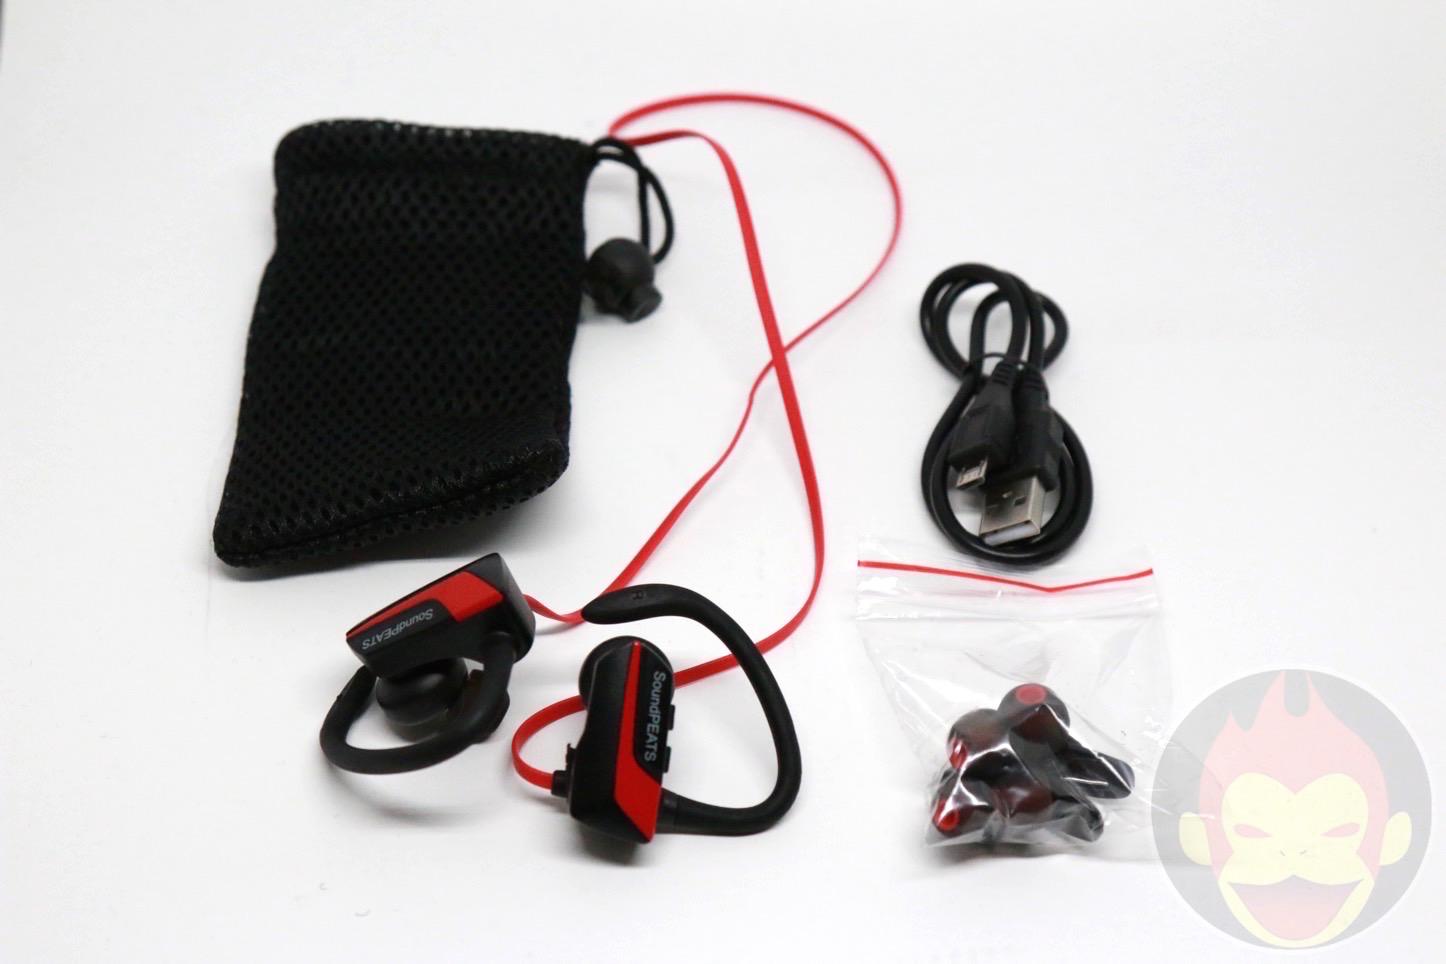 SoundPeats SPORT Q9